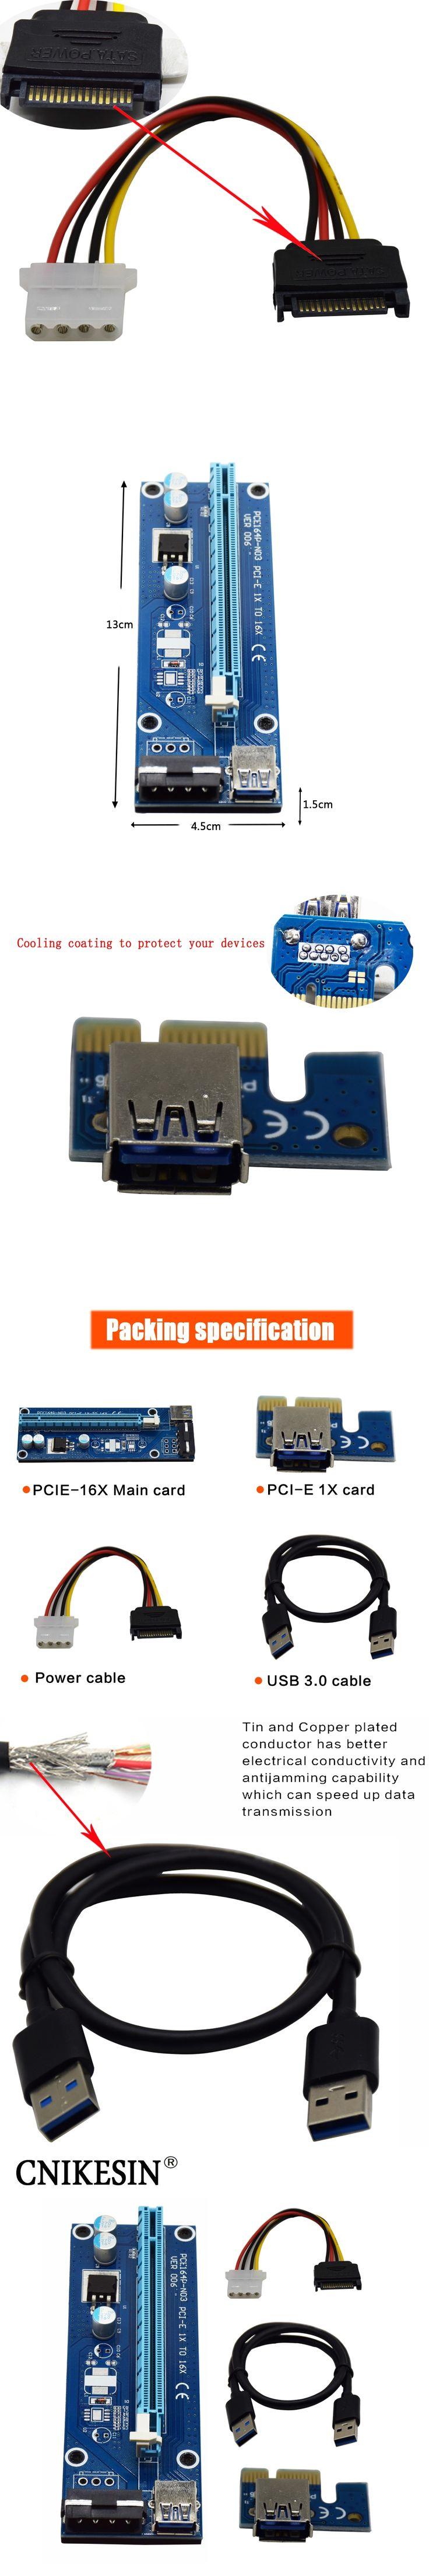 CNKESIN PCIe PCI-E PCI Express Riser Card 1x to 16x USB 3.0 Data Cable SATA to 4Pin IDE Molex Power Supply for BTC Miner Machine